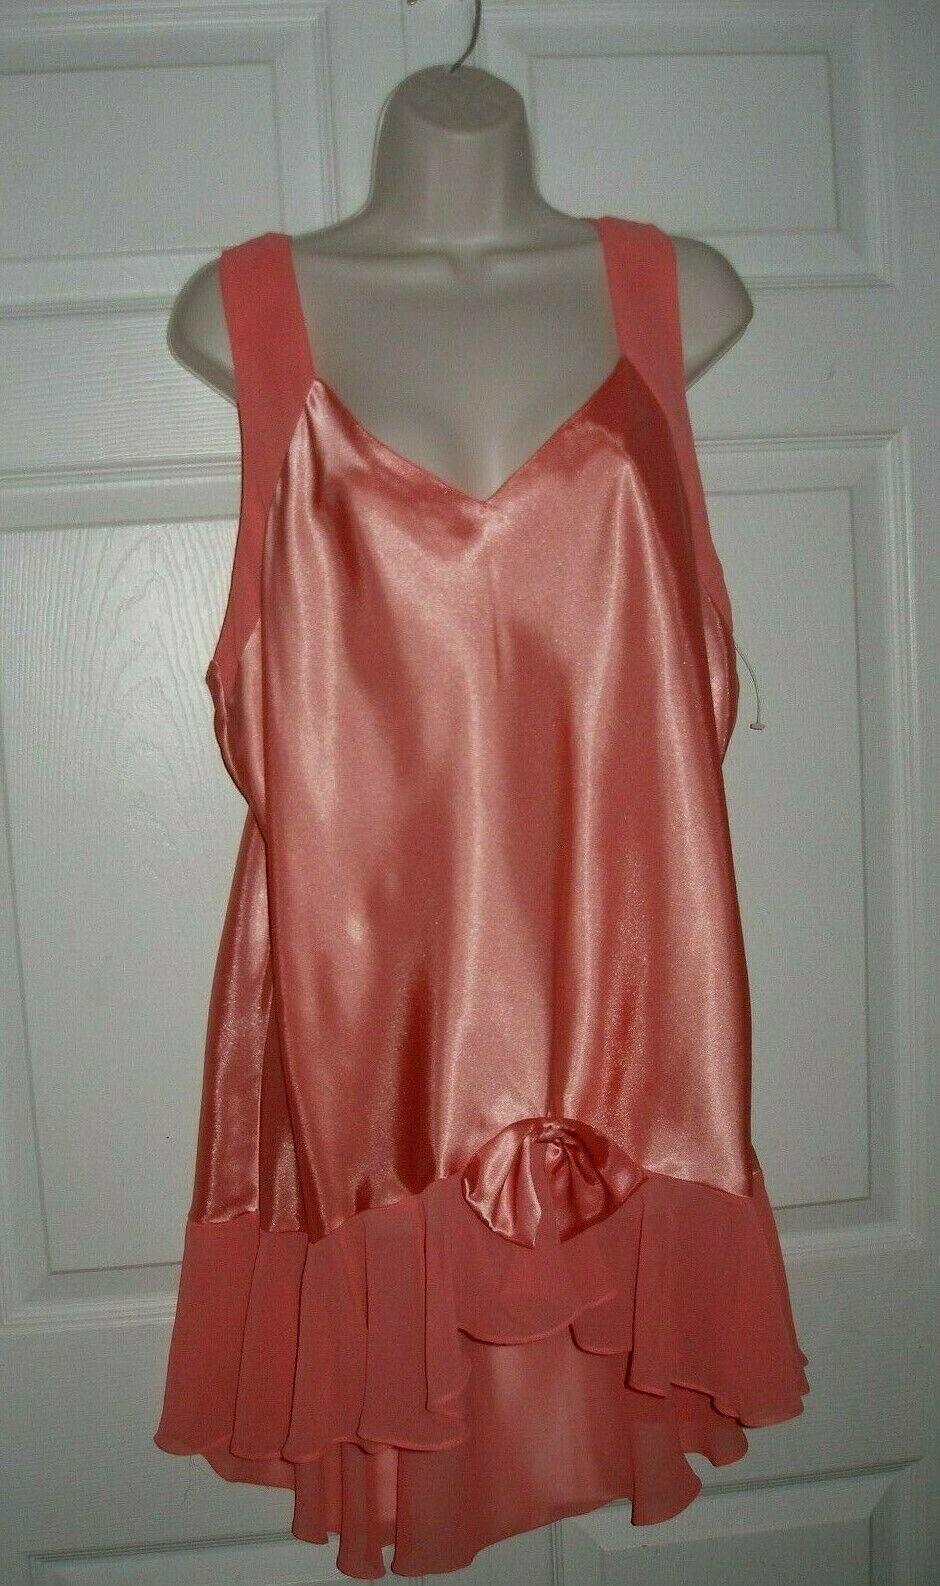 Women's XL Night Gown Vintage Pastel Orange 1920's Flapper Look New